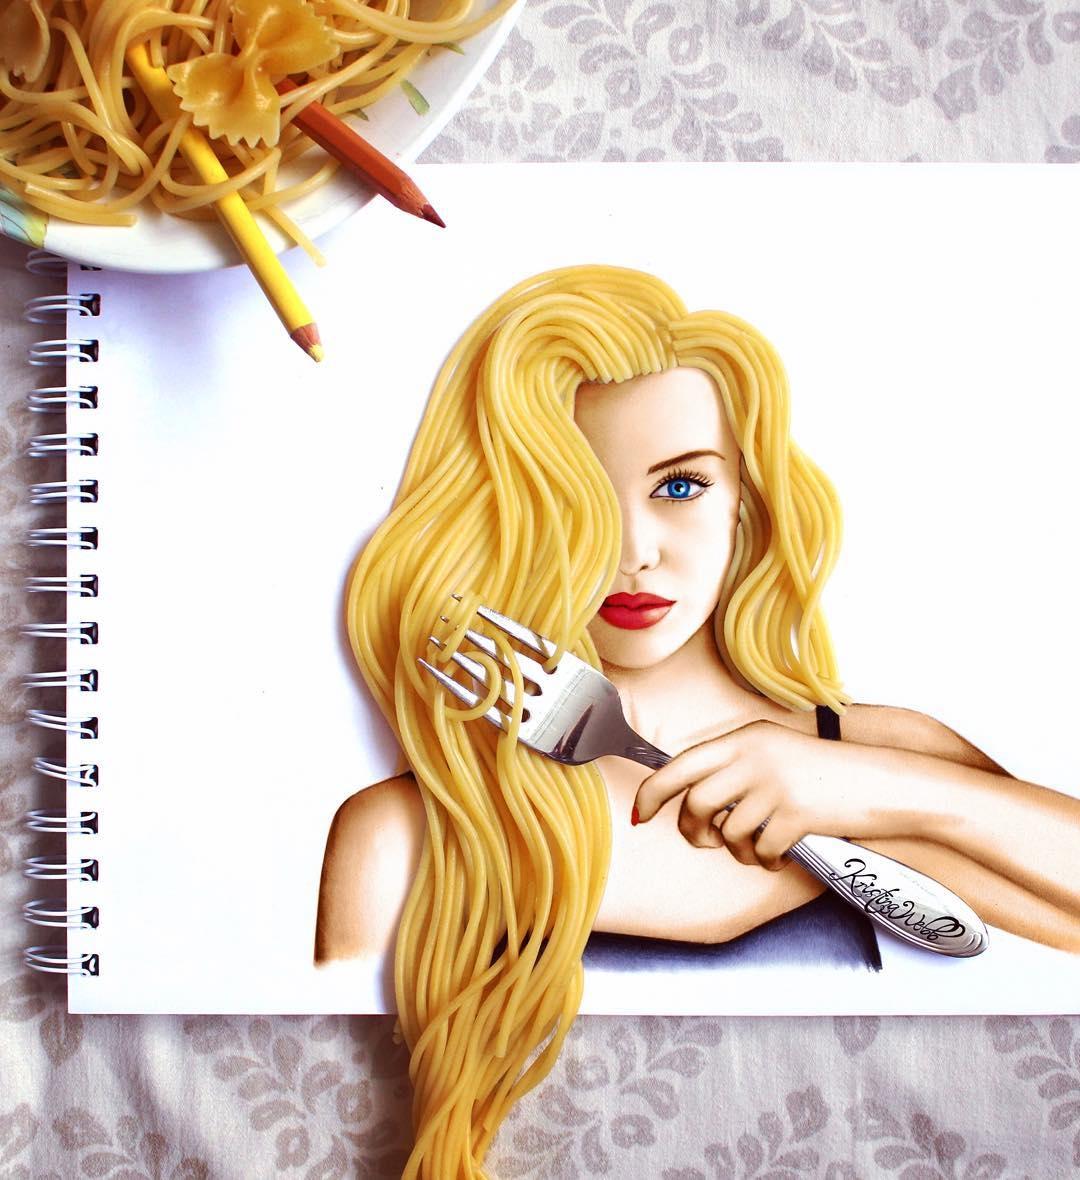 02-Spaghetti-Hair-Kristina-Webb-colour-me-creative-Drawings-Exploring-a-Range-Different-Techniques-www-designstack-co